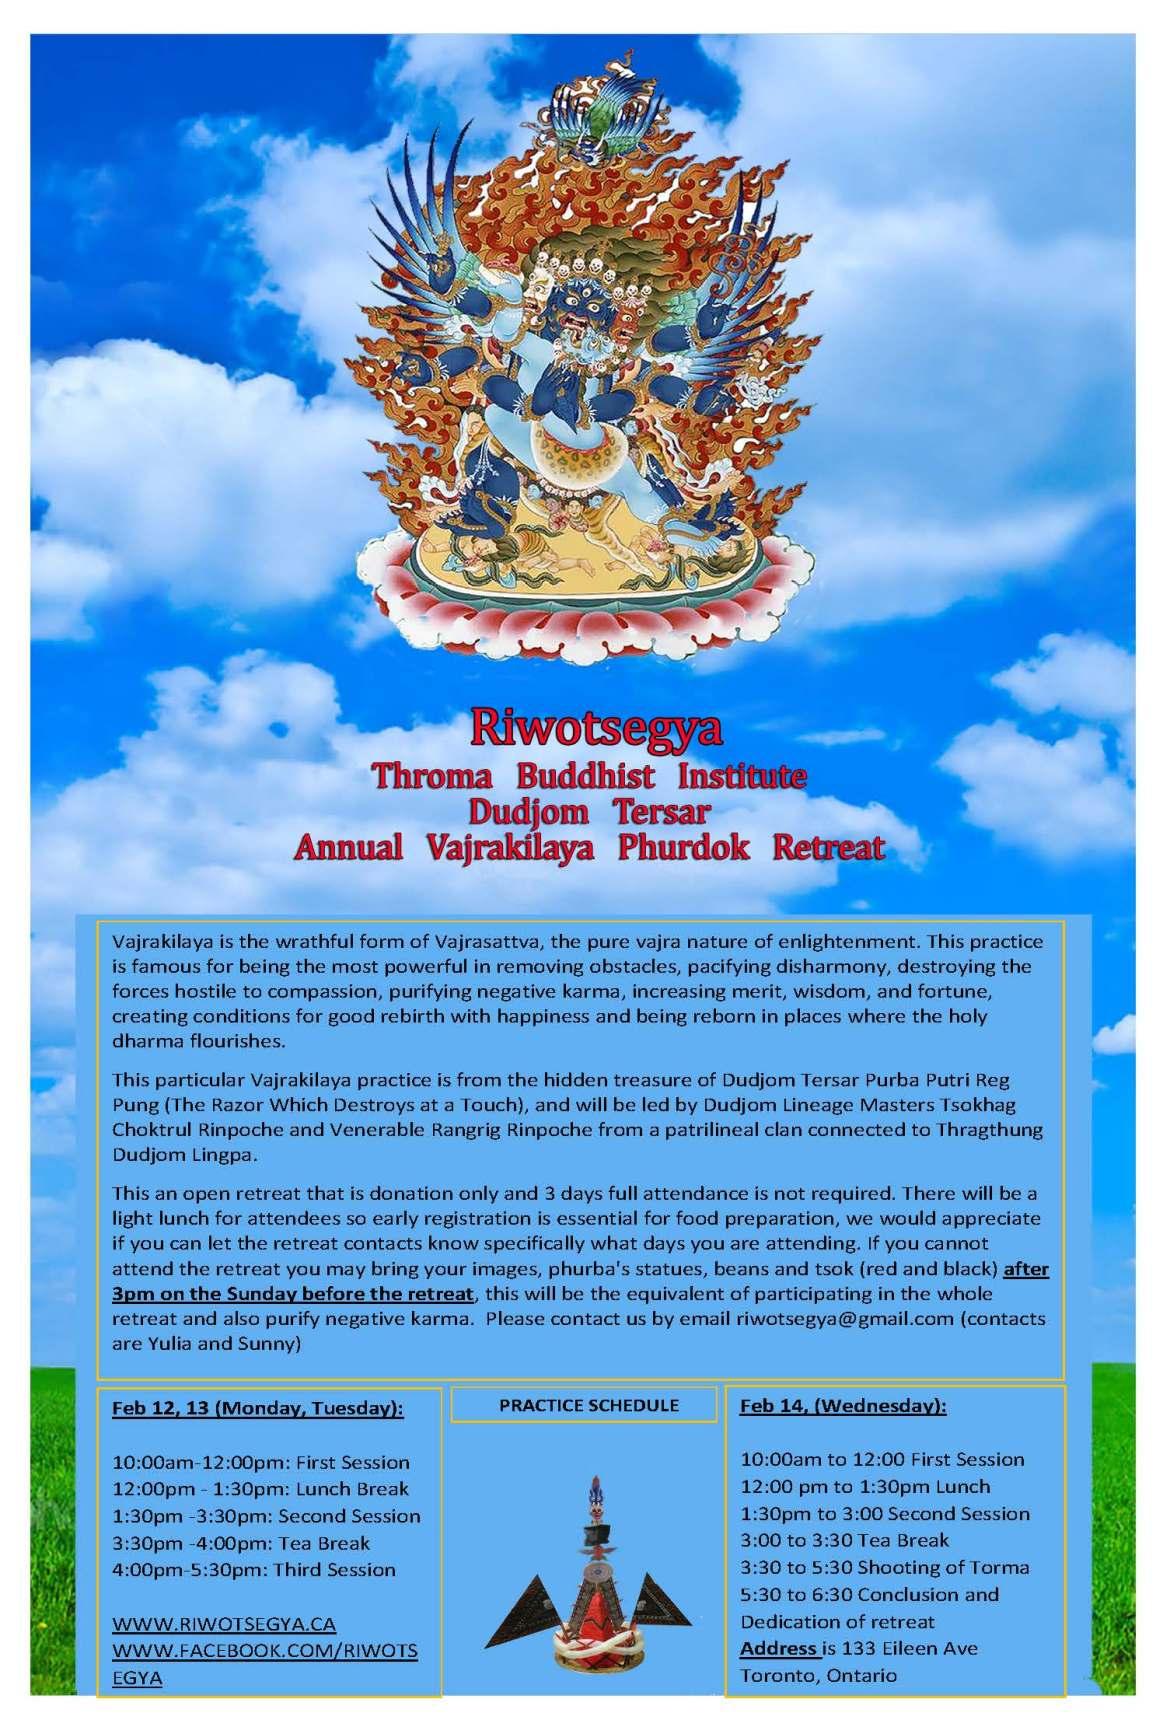 Riwotsegya Annual 3 Day open Vajrakilaya Phurdok Retreat Feb 12,13,14 2018